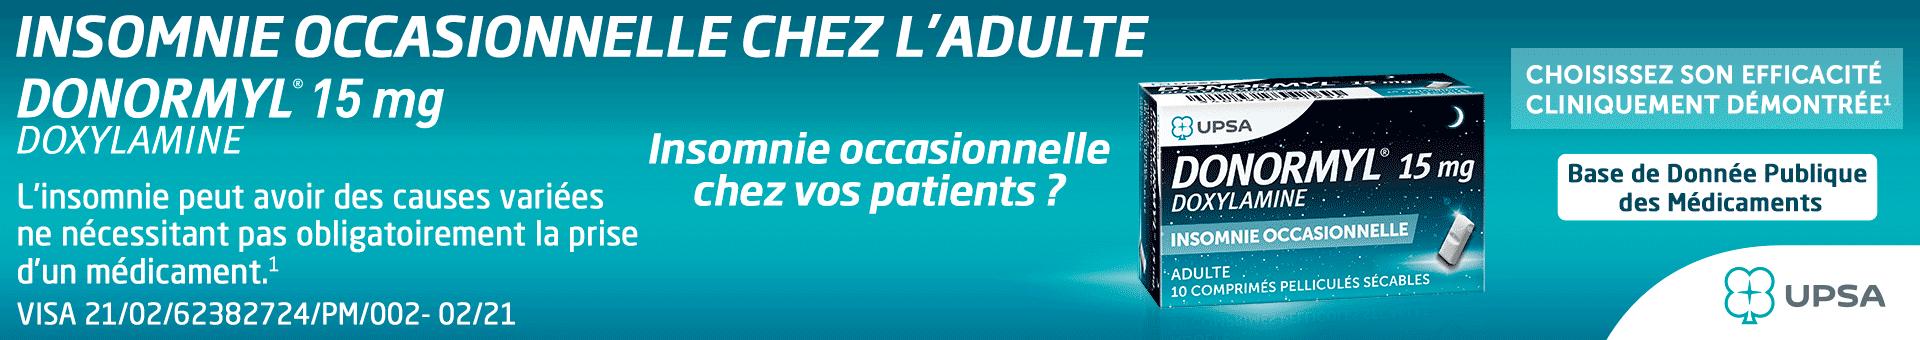 Pharmacie Du Marché,SAINT-PRIEST